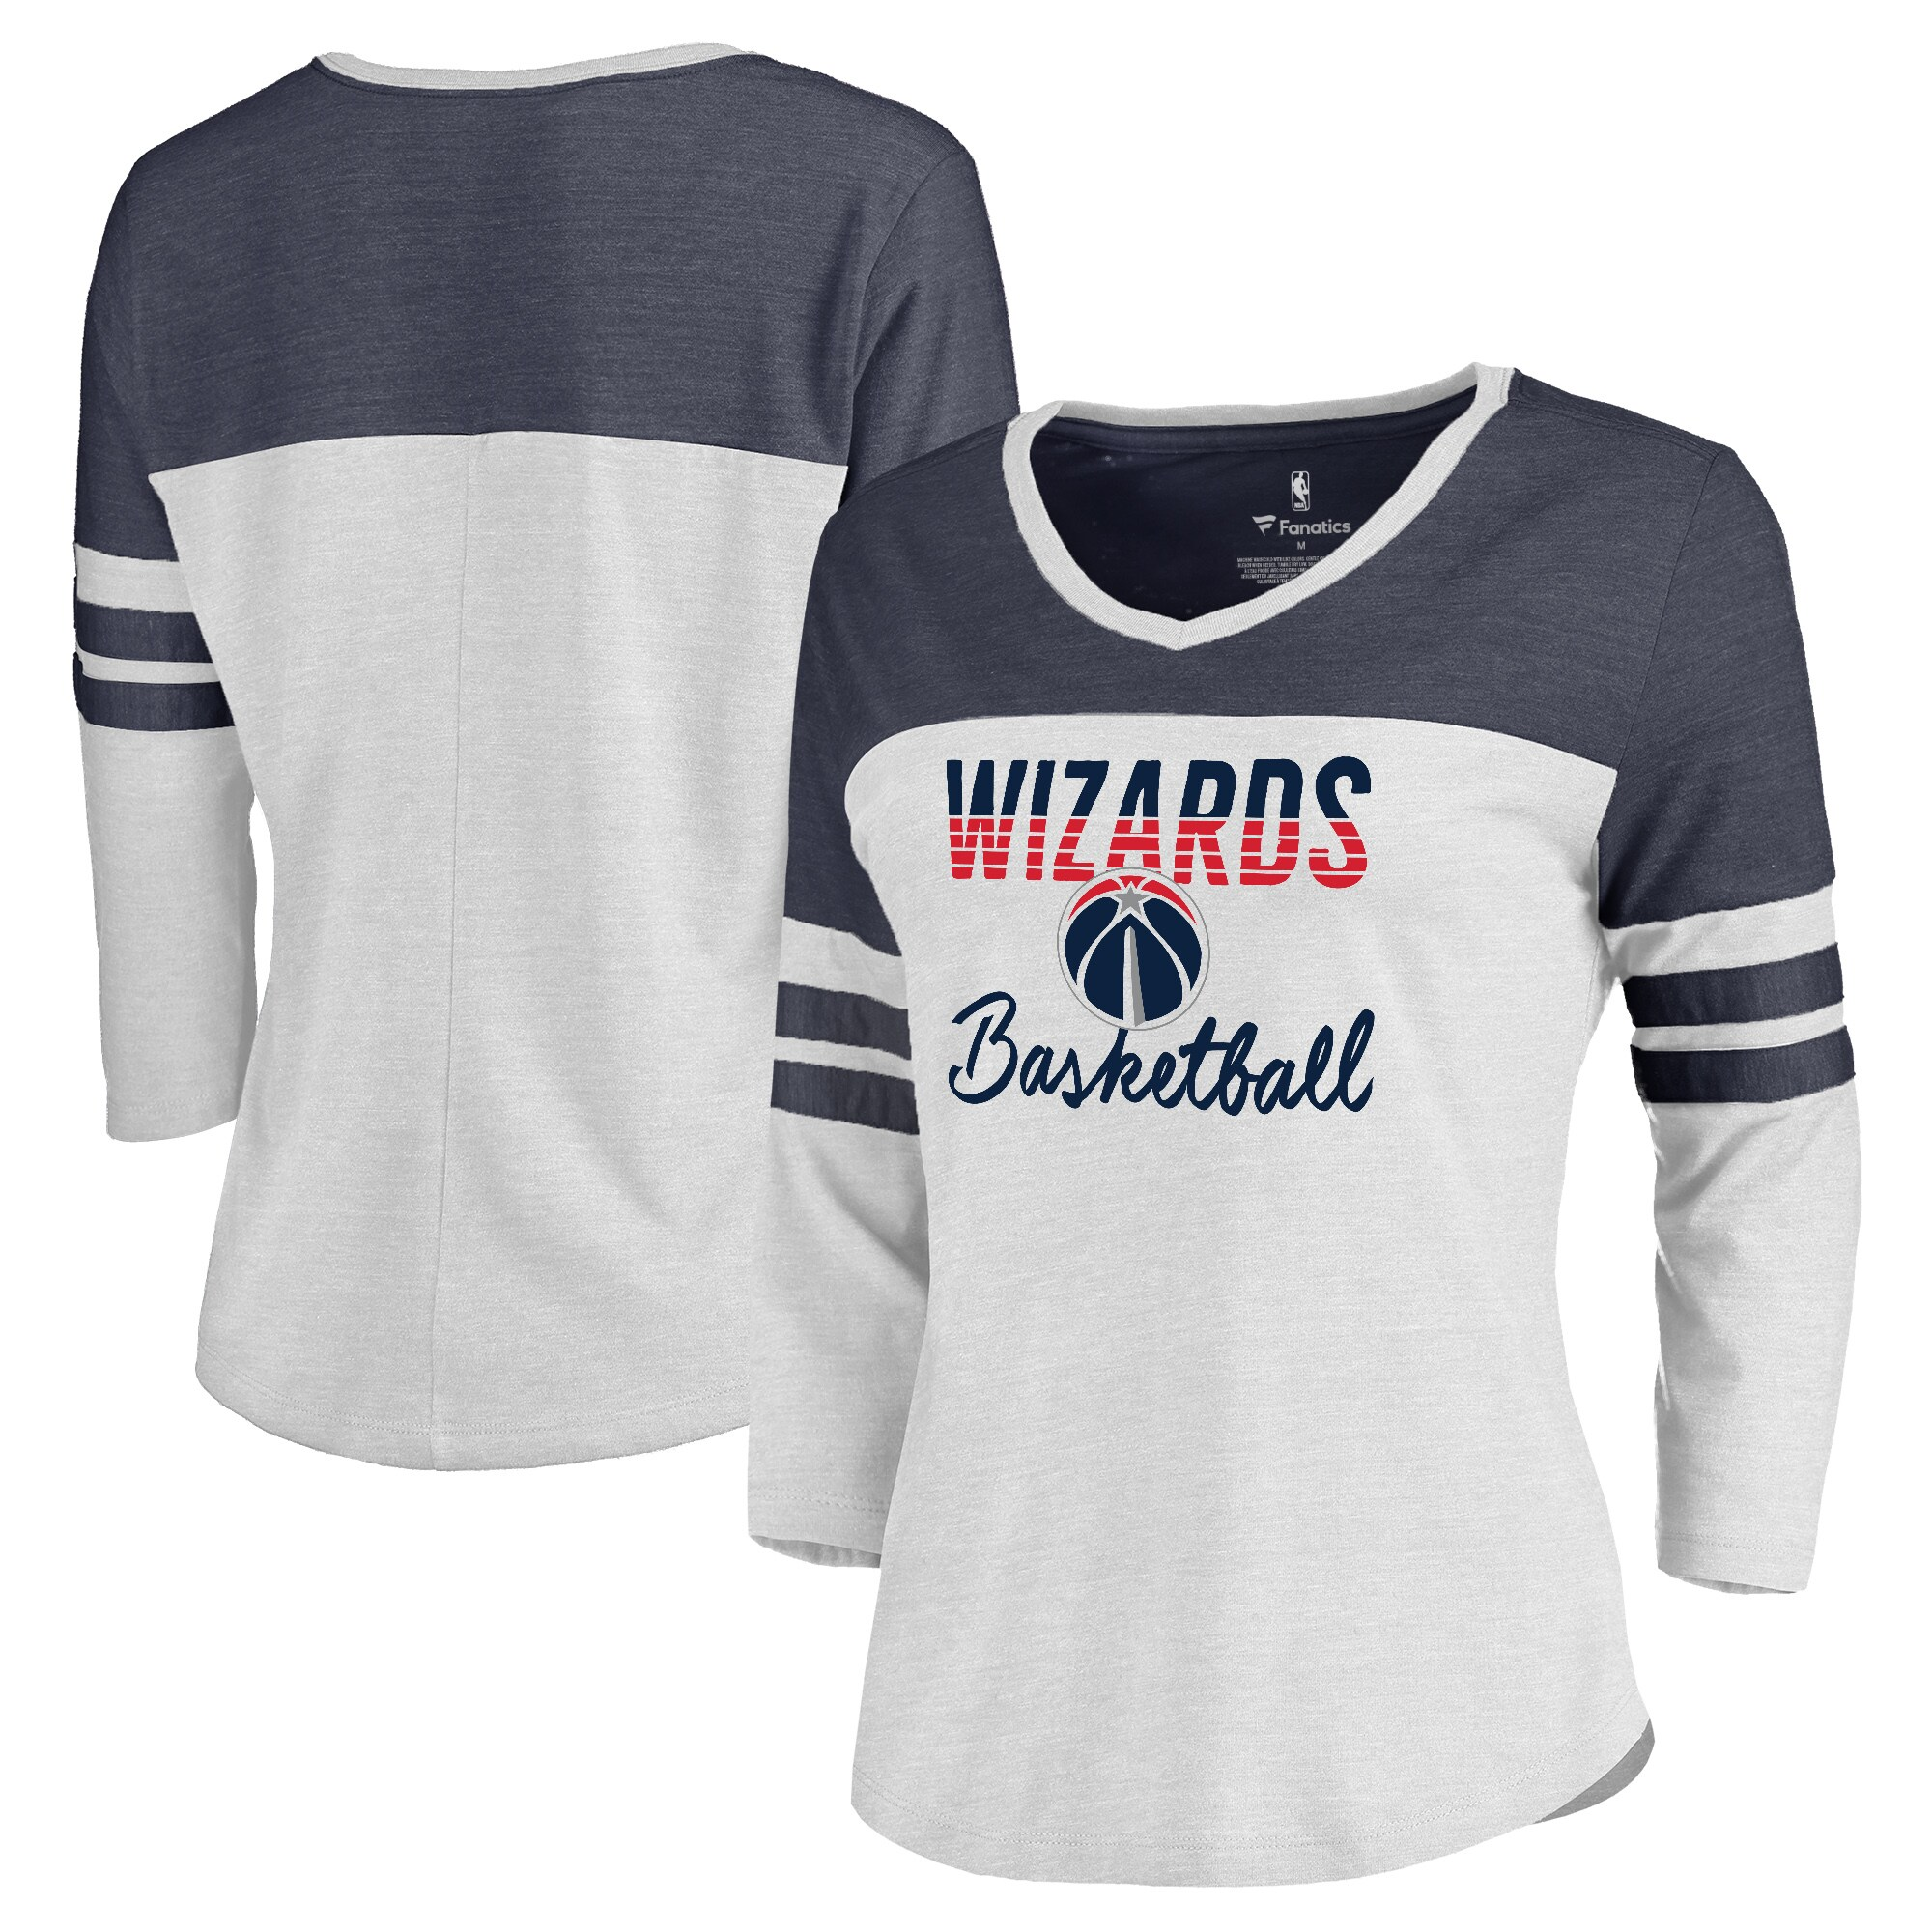 Washington Wizards Fanatics Branded Women's Plus Size Free Line Color Block 3/4-Sleeve Tri-Blend T-Shirt - White/Navy